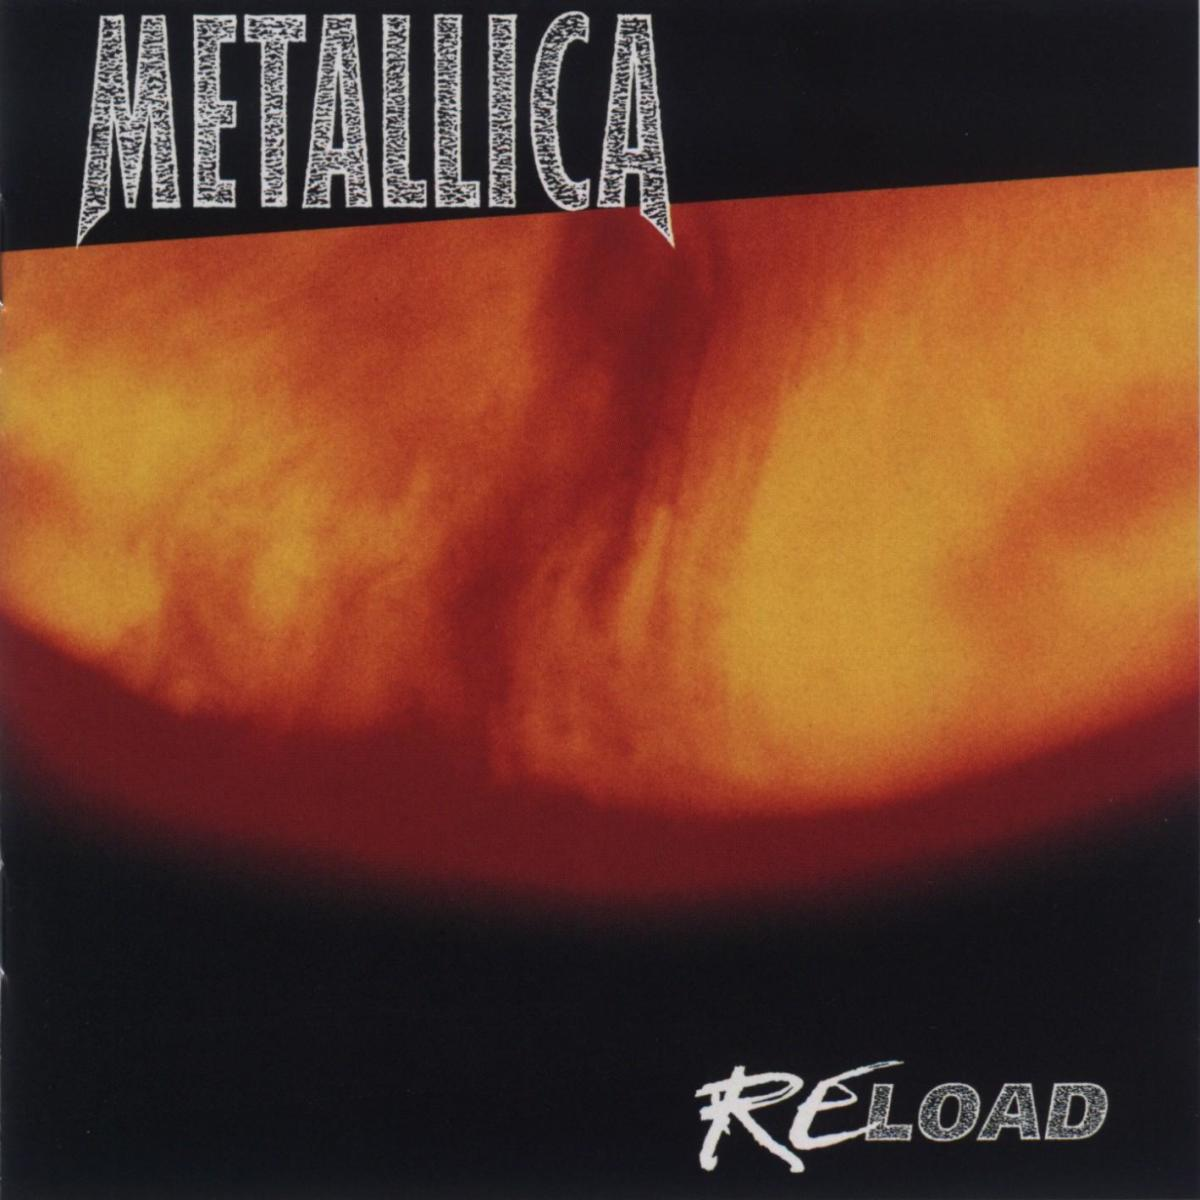 A Review of a Forgotten album: Metallica's 7th studio album